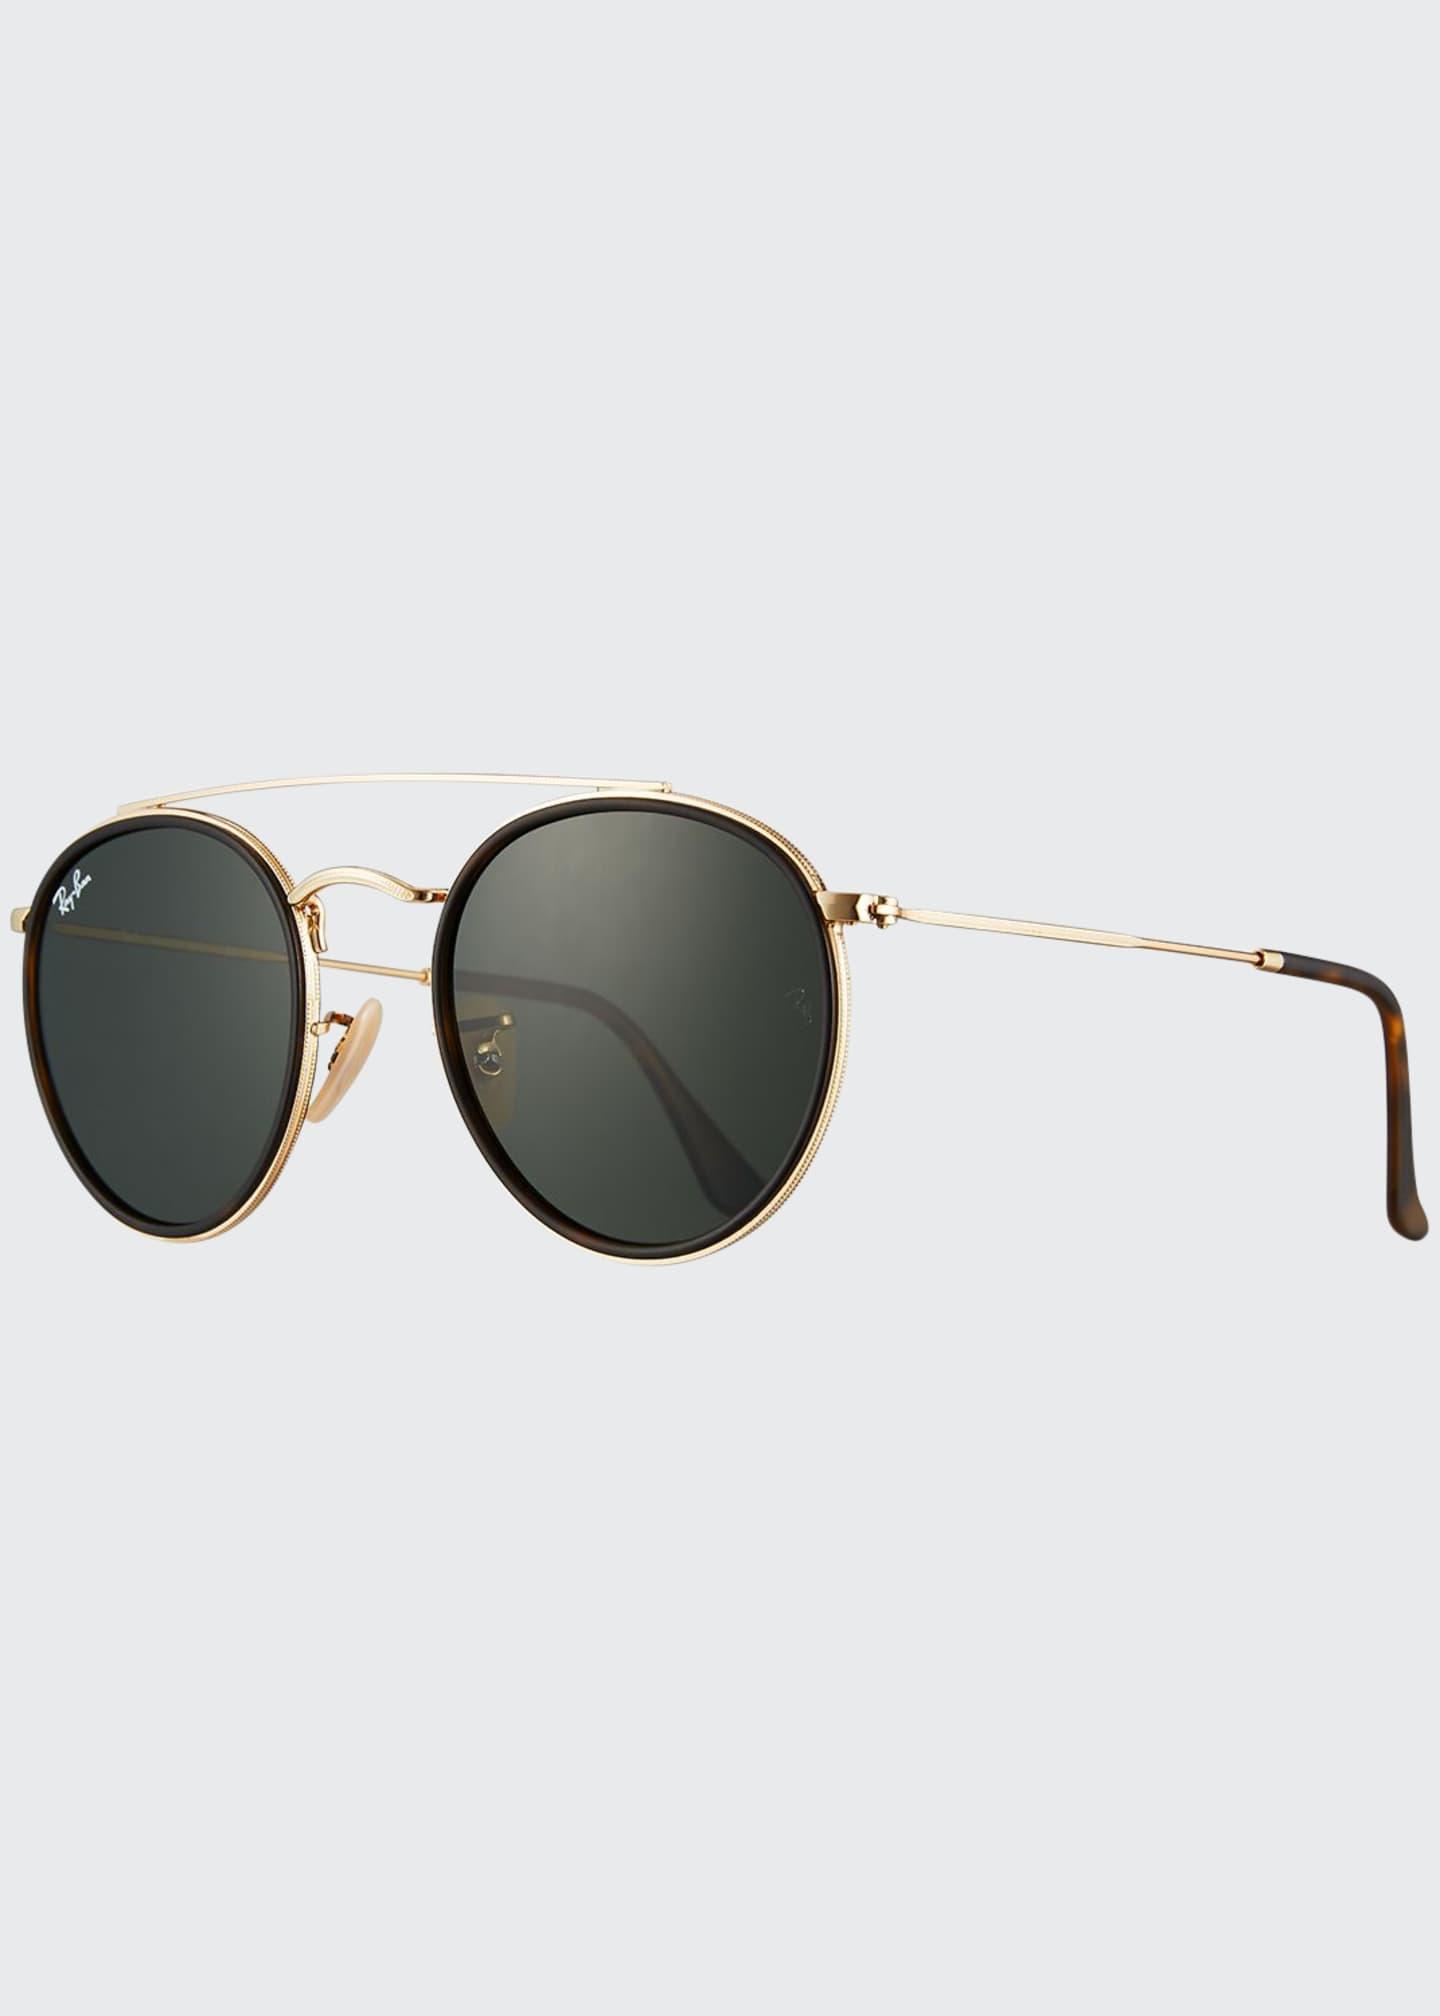 Ray-Ban Round Double-Bridge G-15® Sunglasses